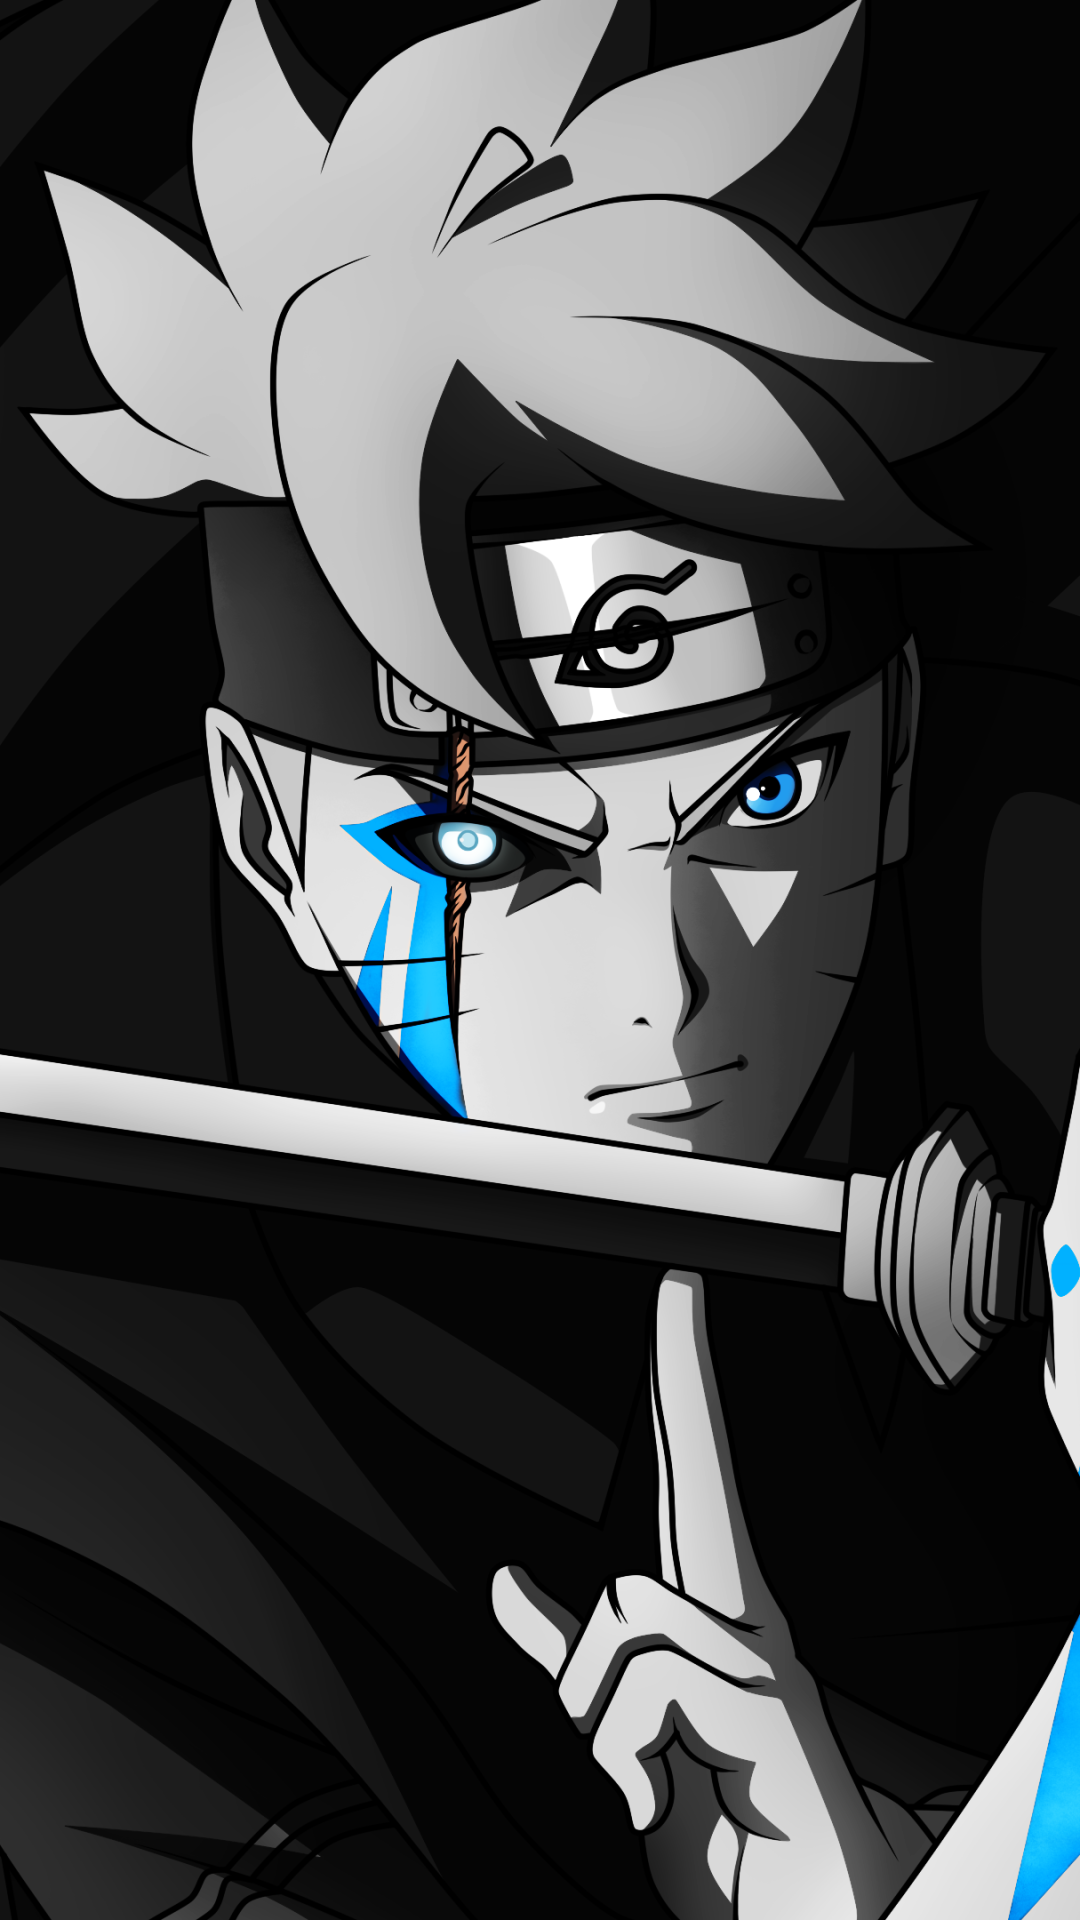 Manga おしゃれまとめの人気アイデア Pinterest Bintang Grp